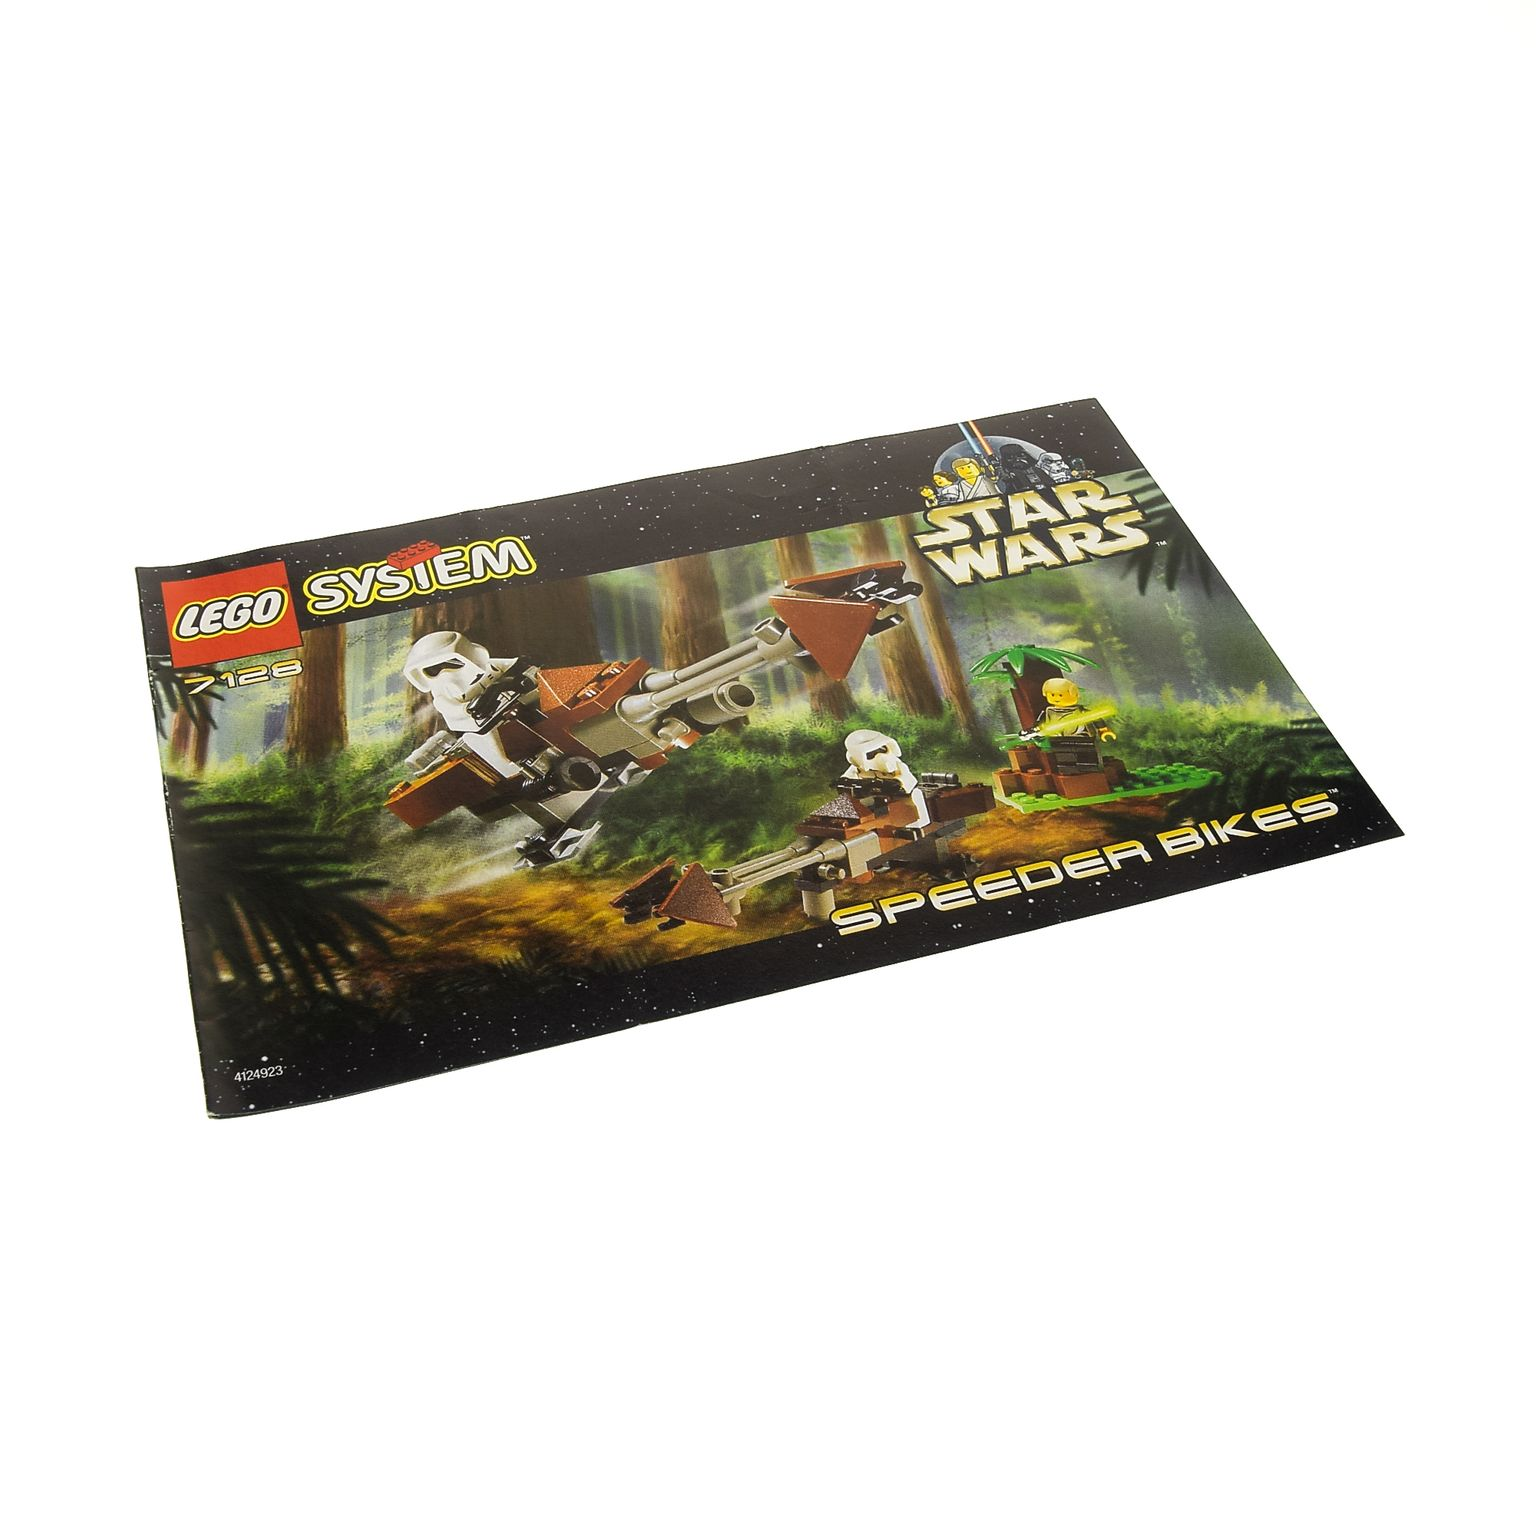 1 X Lego Brick Instructions For Set Star Wars Episode 4 5 6 Speeder Skeleton Tower 7093 Bikes 7128